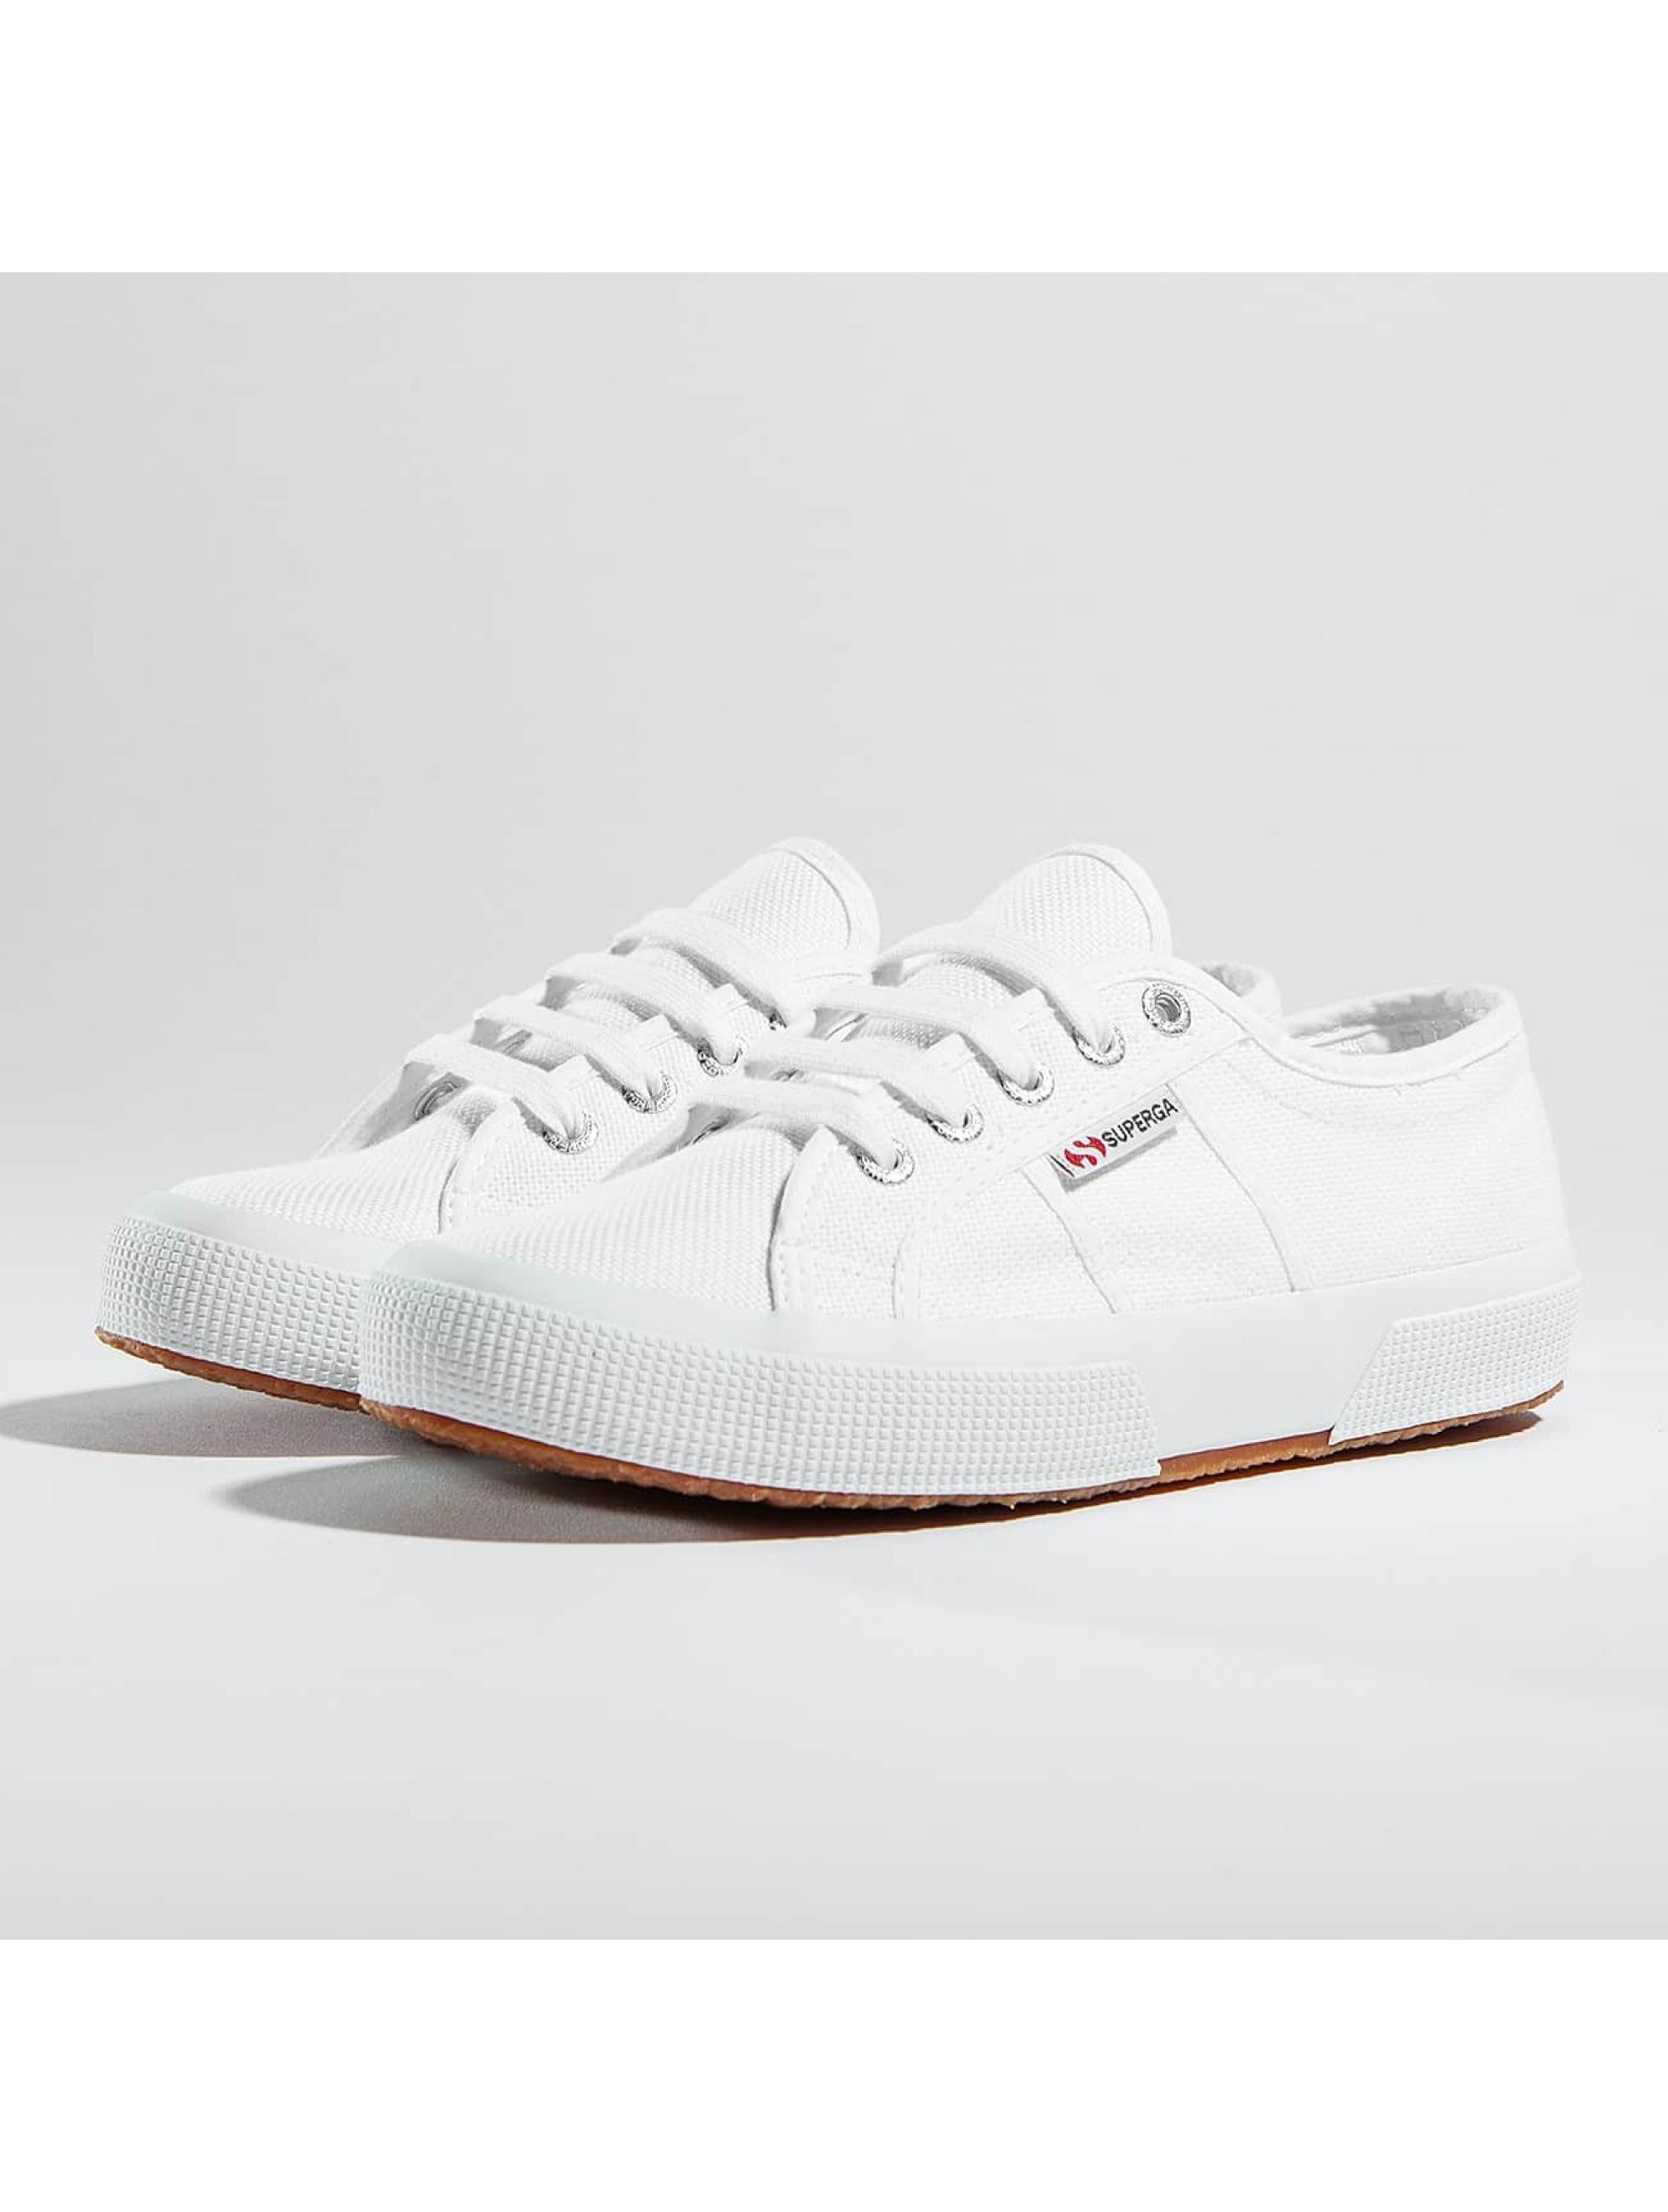 Superga Sneakers 2750 Cotu white